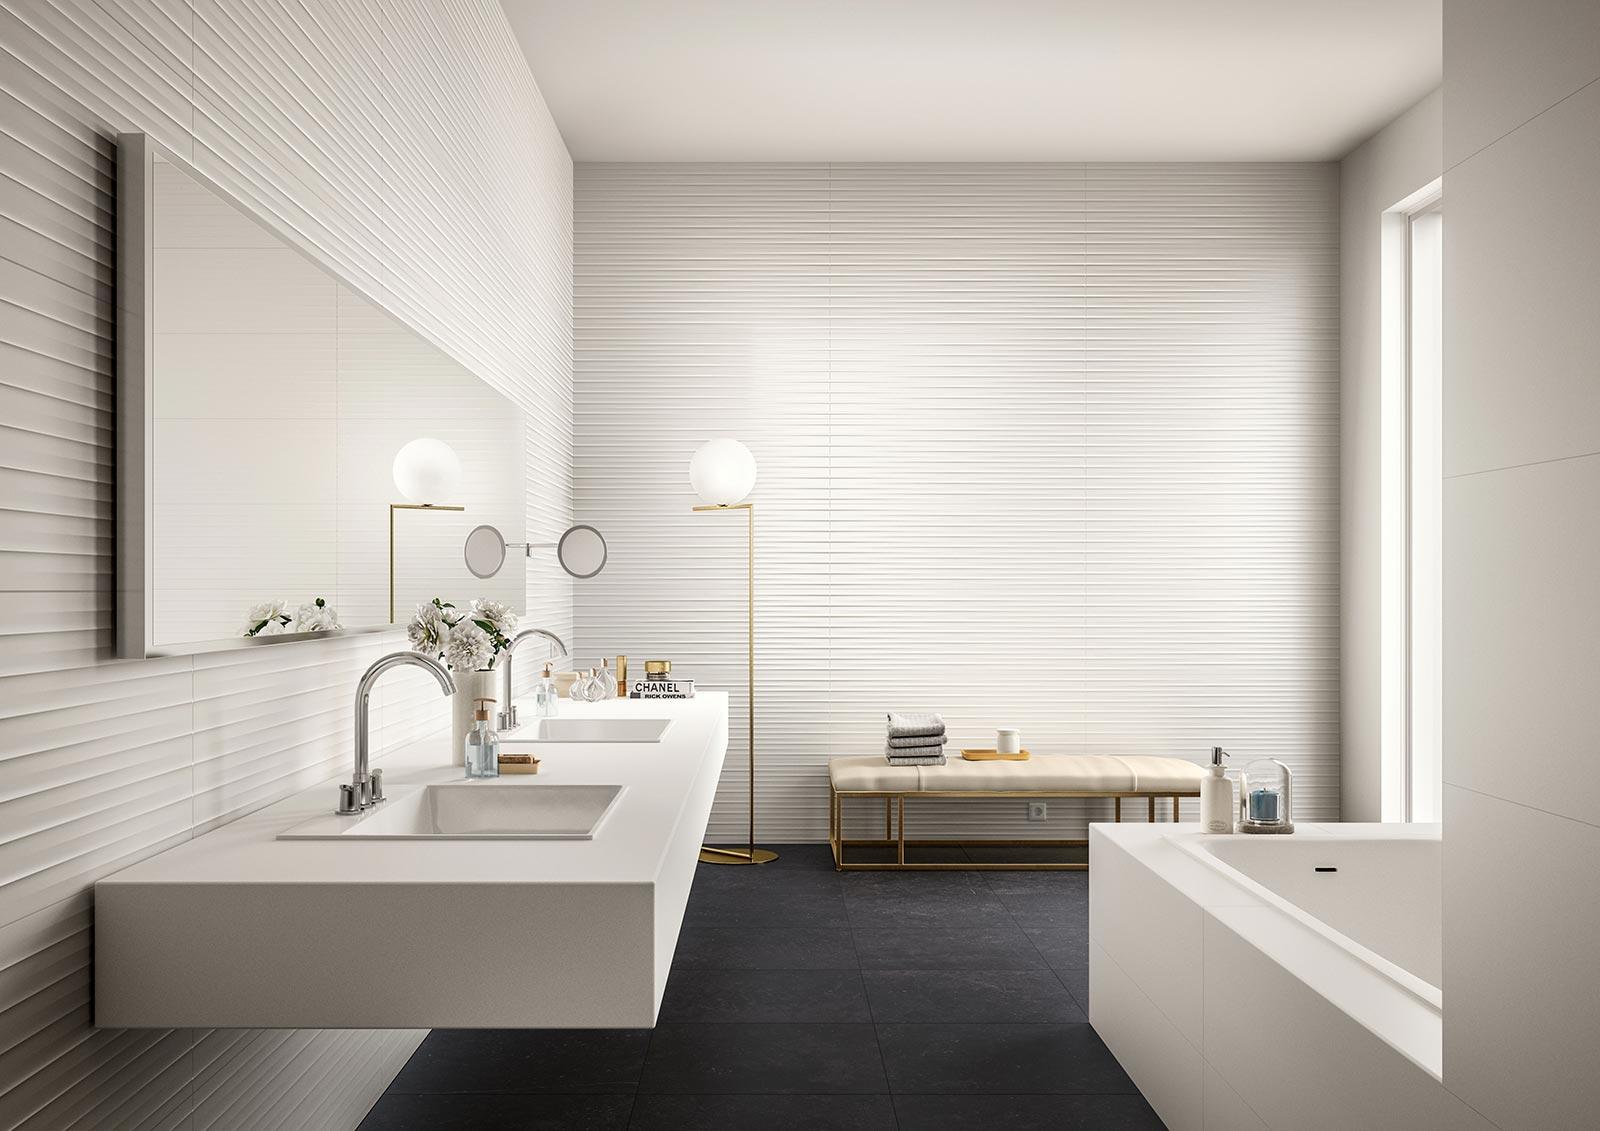 Carrelage salle de bain c ramique et gr s c rame marazzi for Aquamondo salle de bain